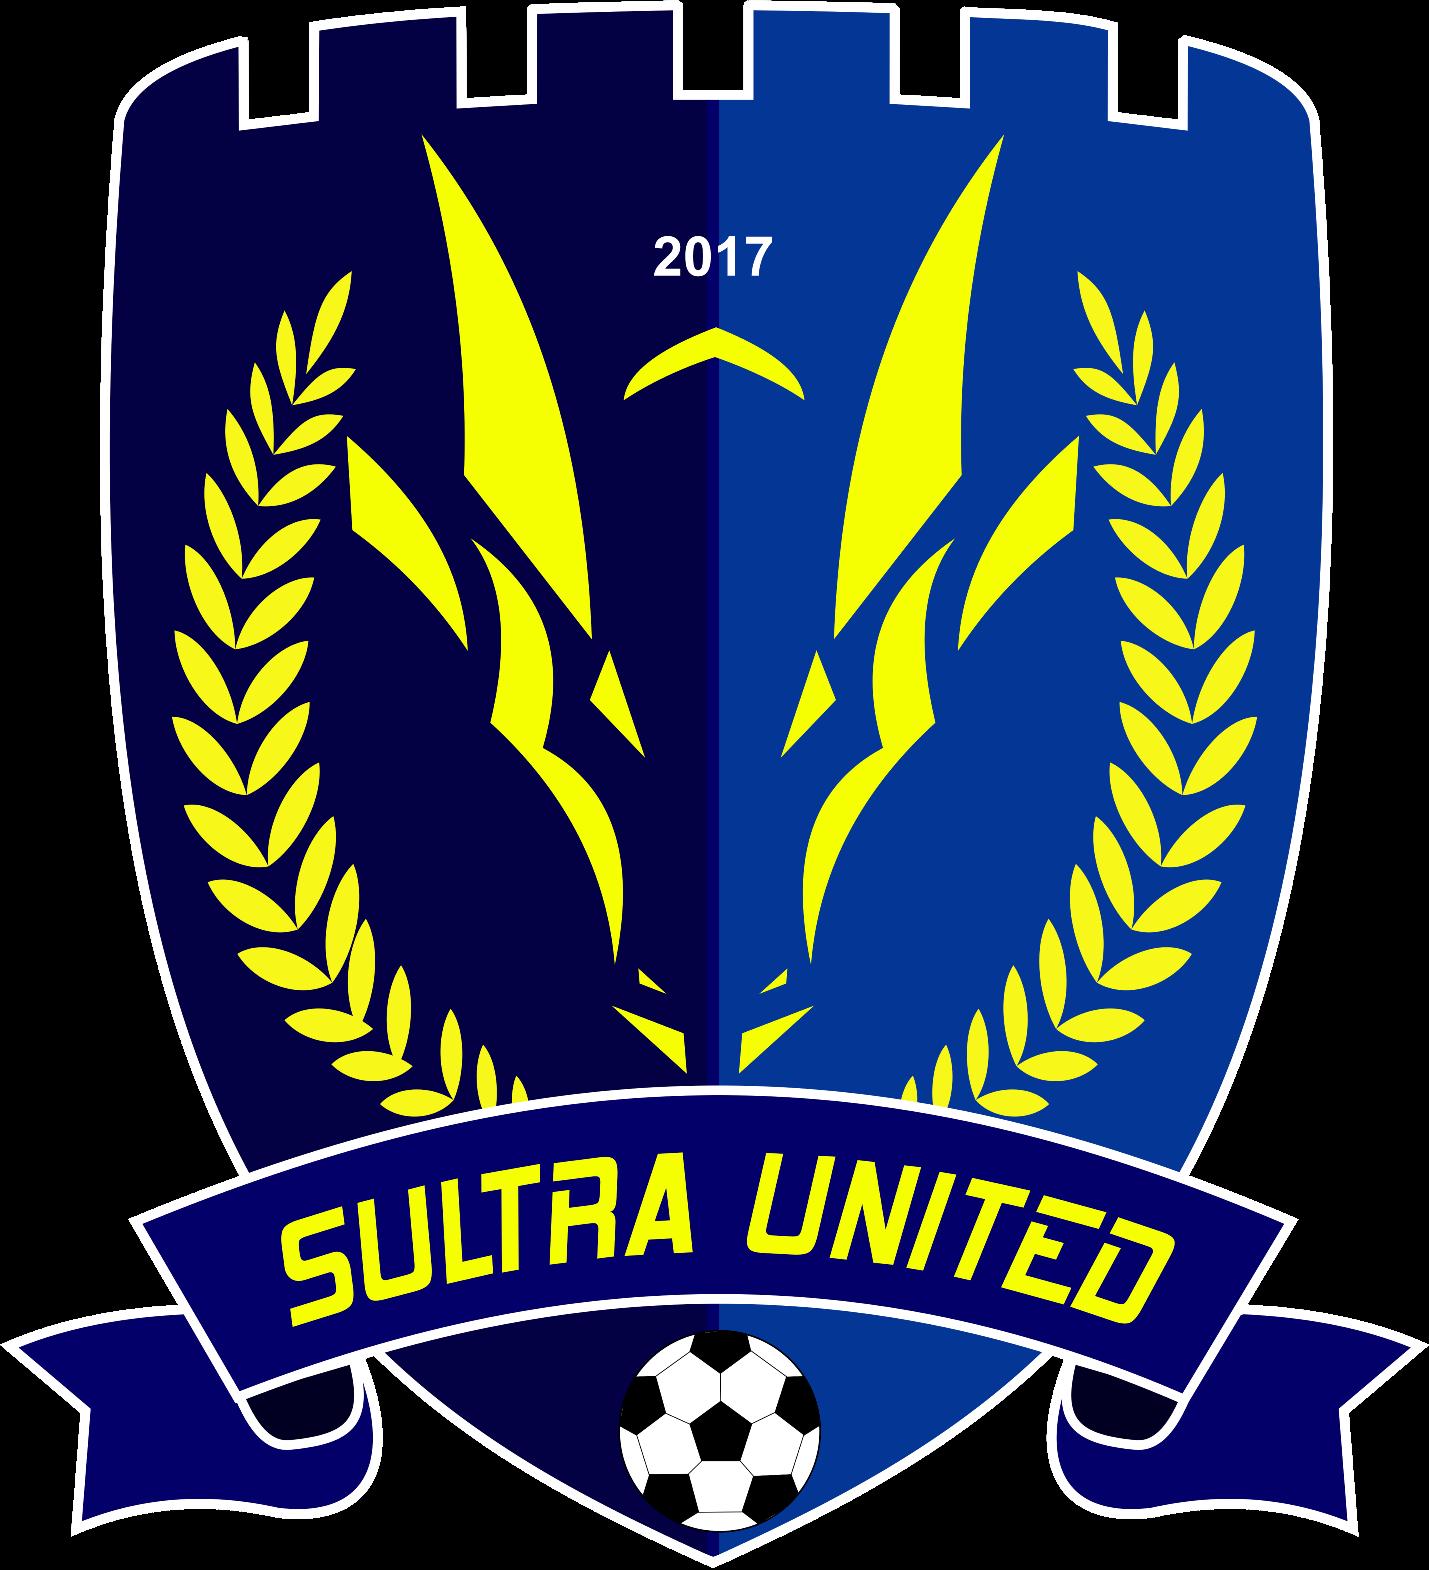 SULTRA UNITED